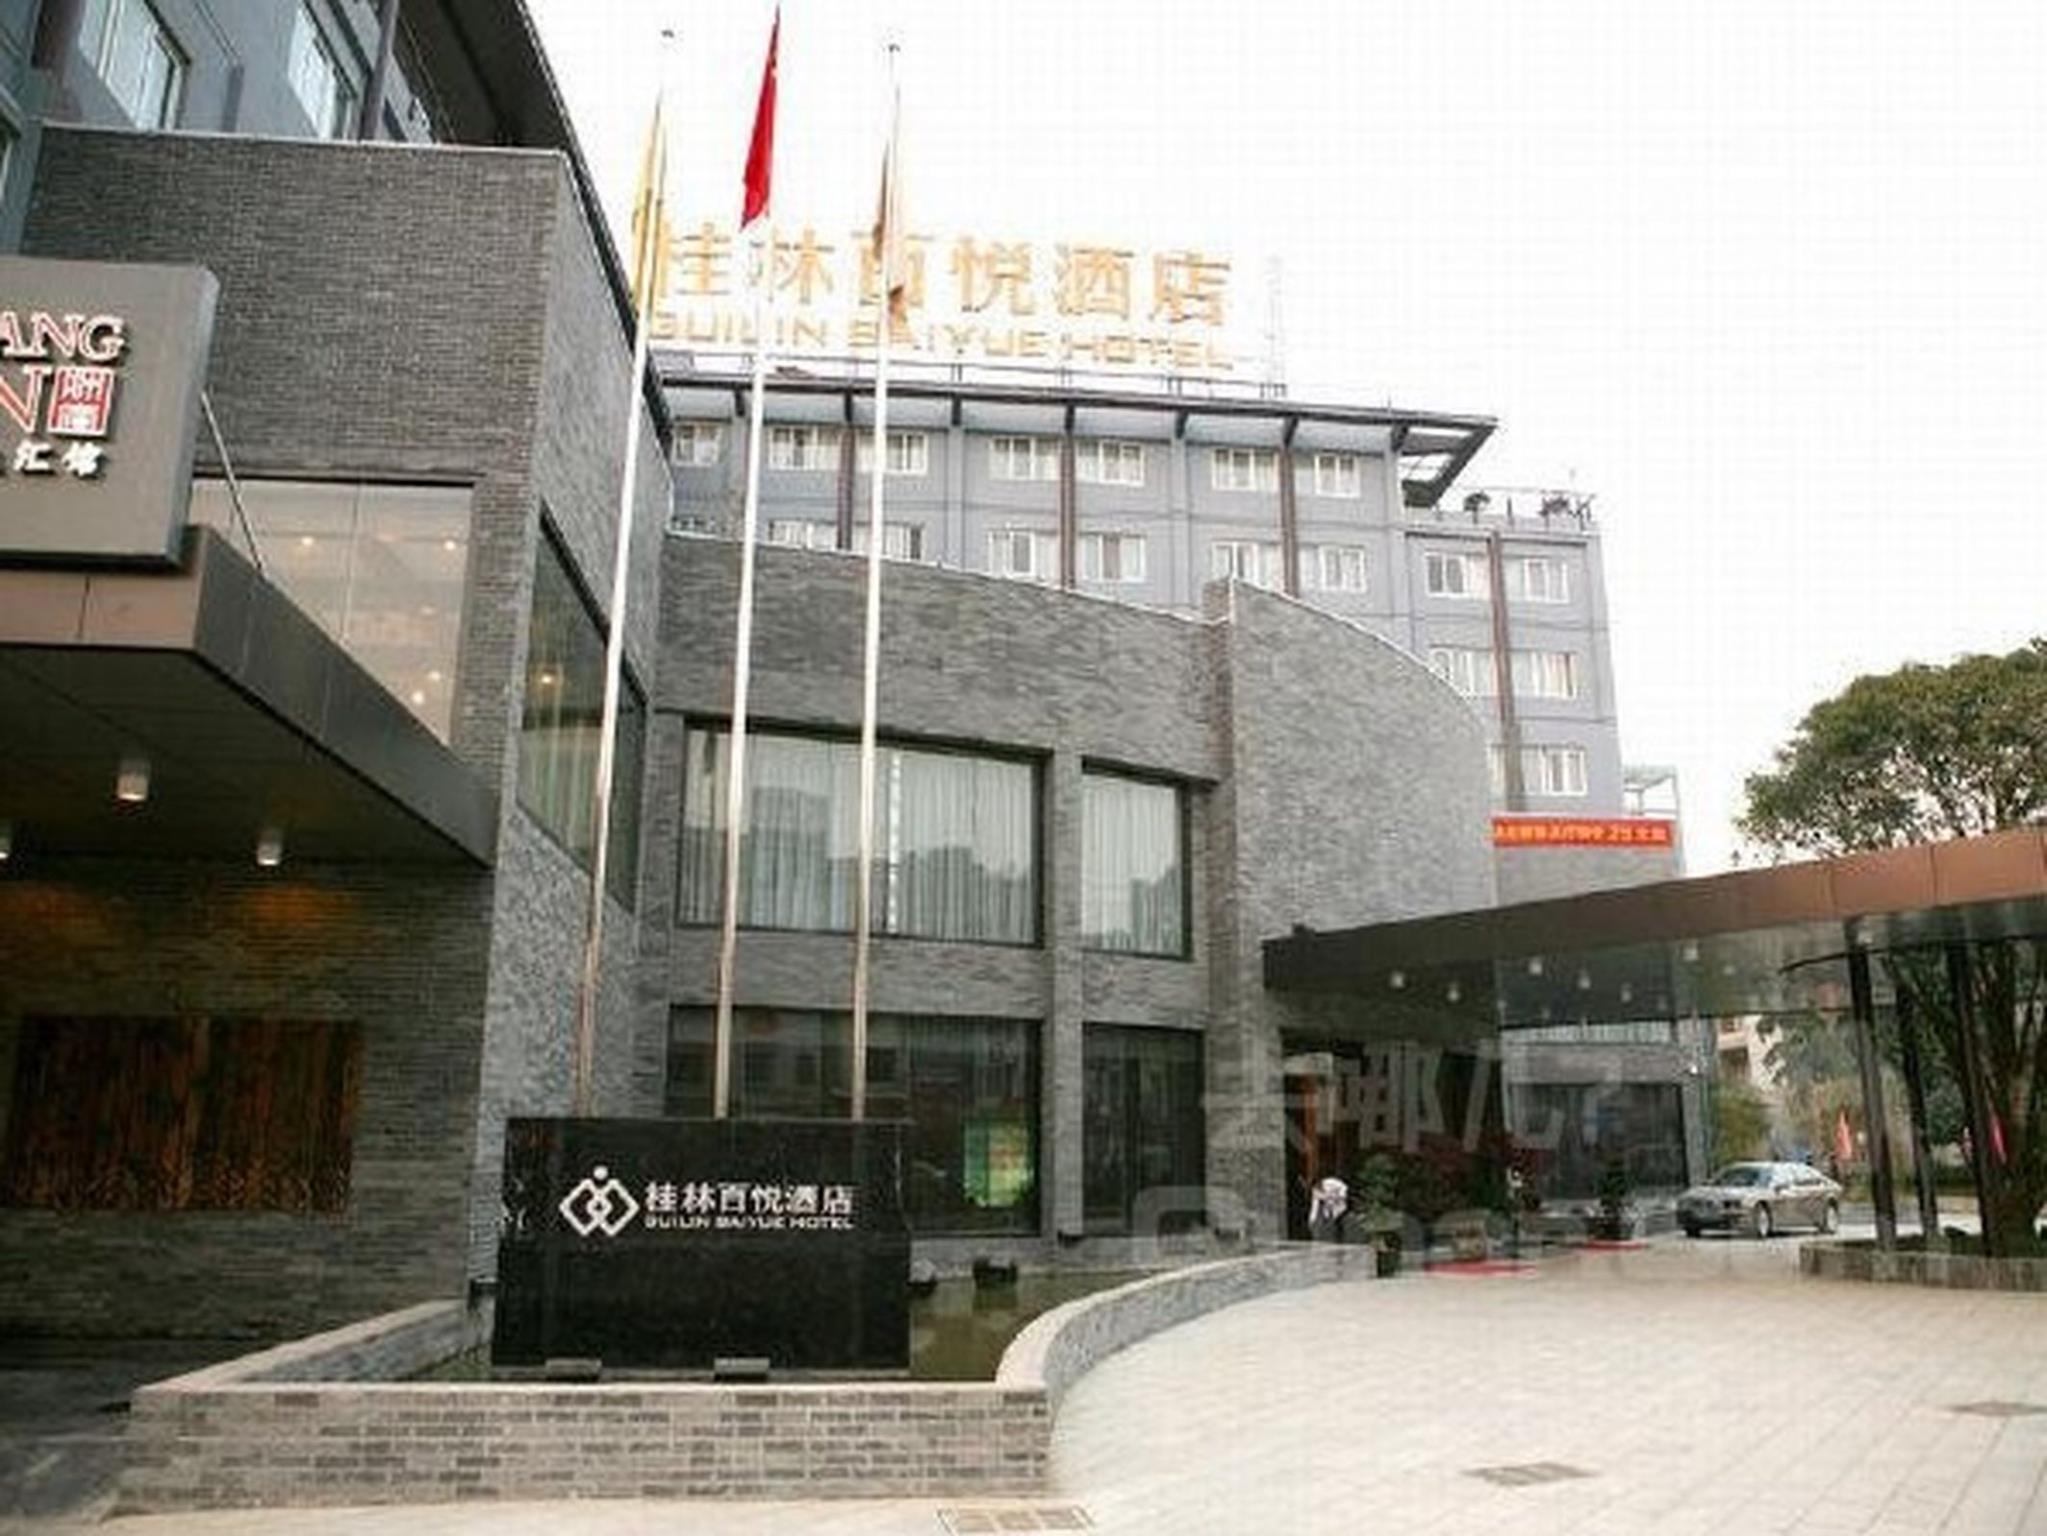 Guilin Baiyue Hotel